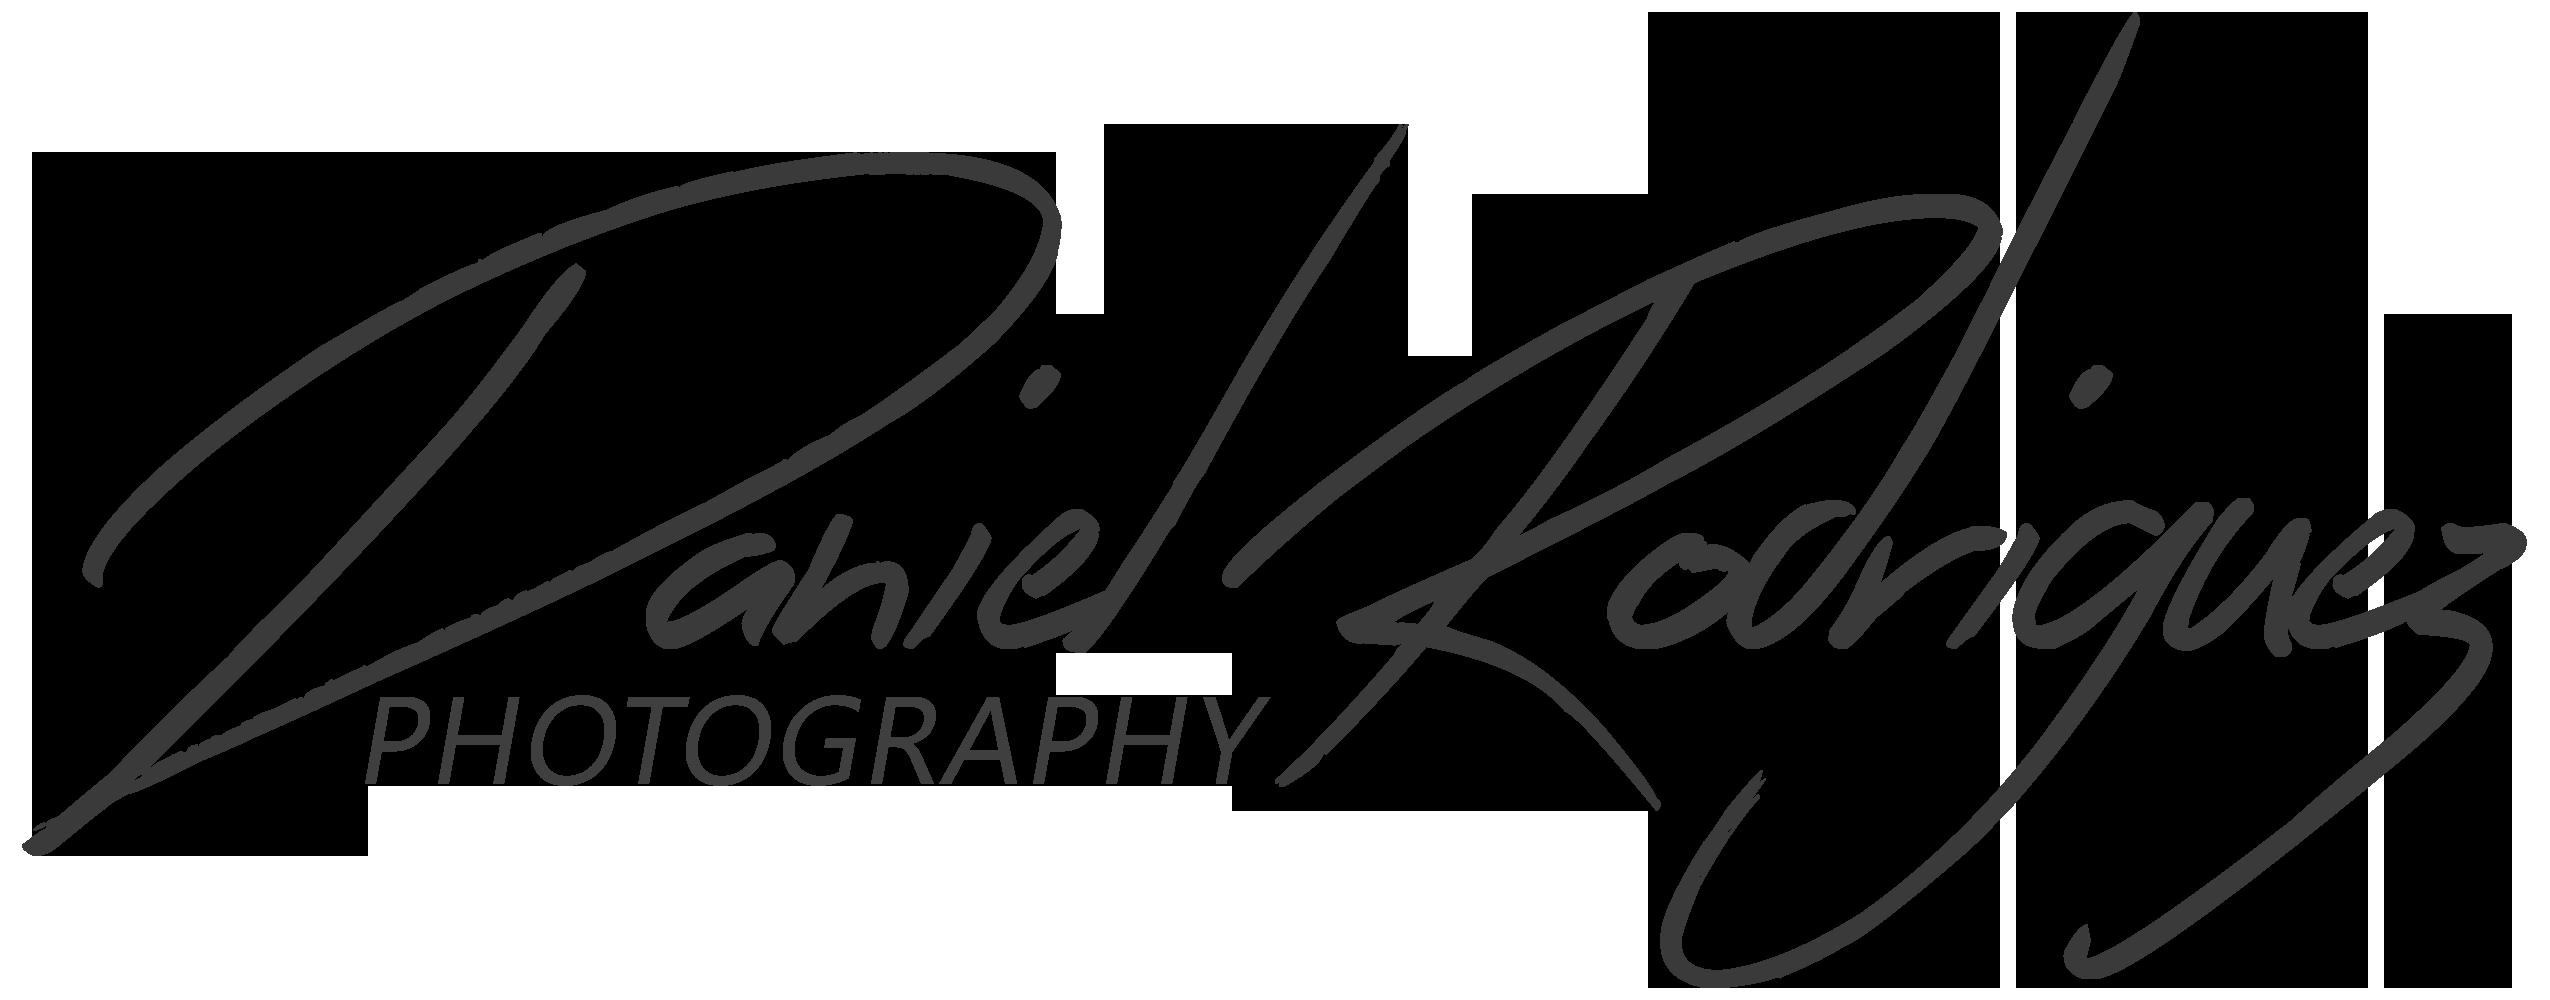 Daniel Rodríguez photography and video